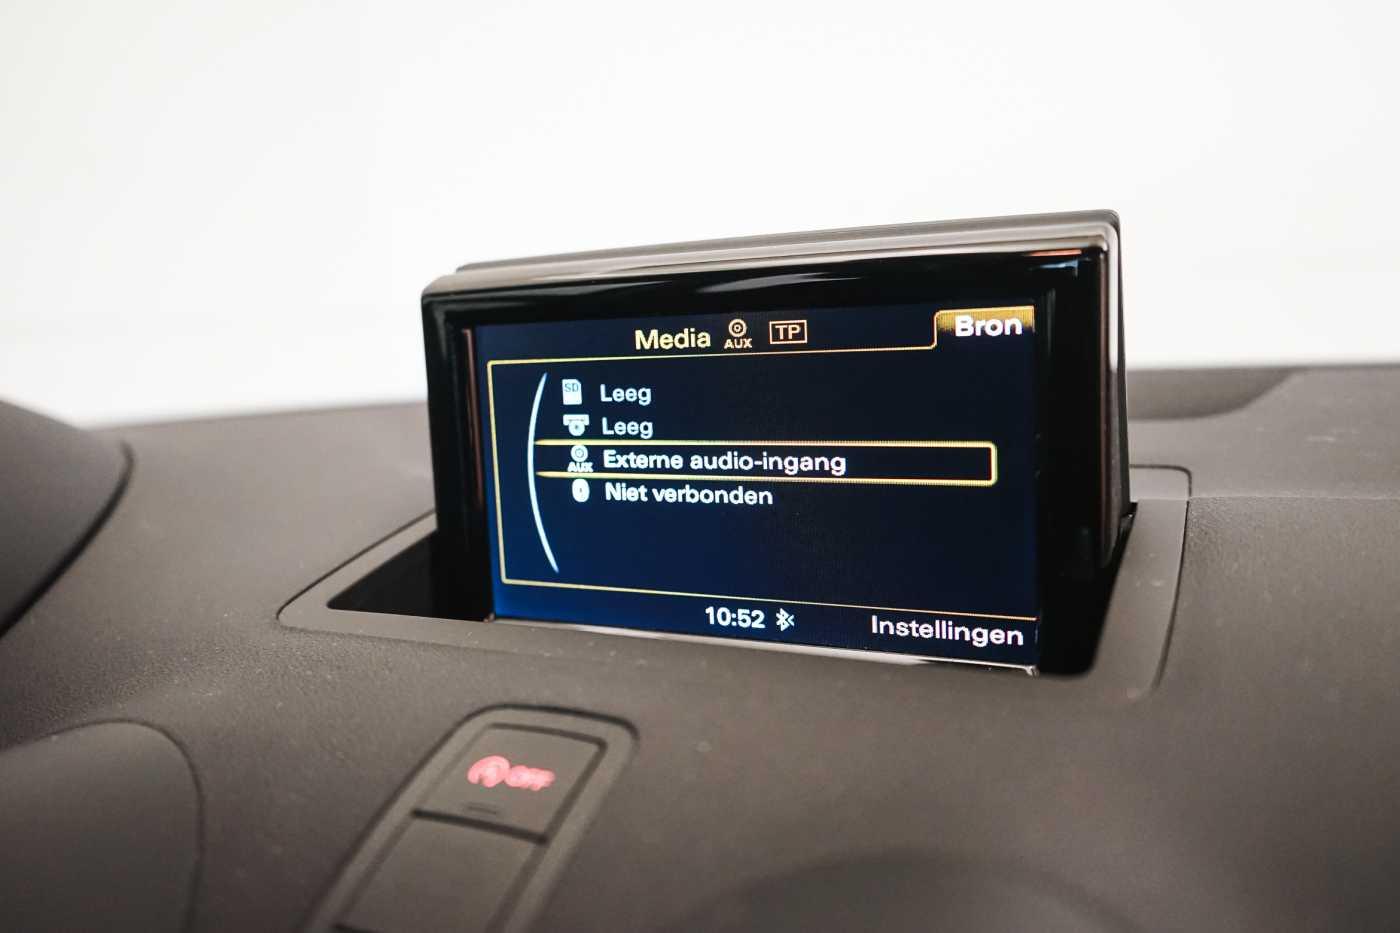 Audi A1 Proline Admired S-Line // Bluetooth, Zetelverwarming, Airco 21/31